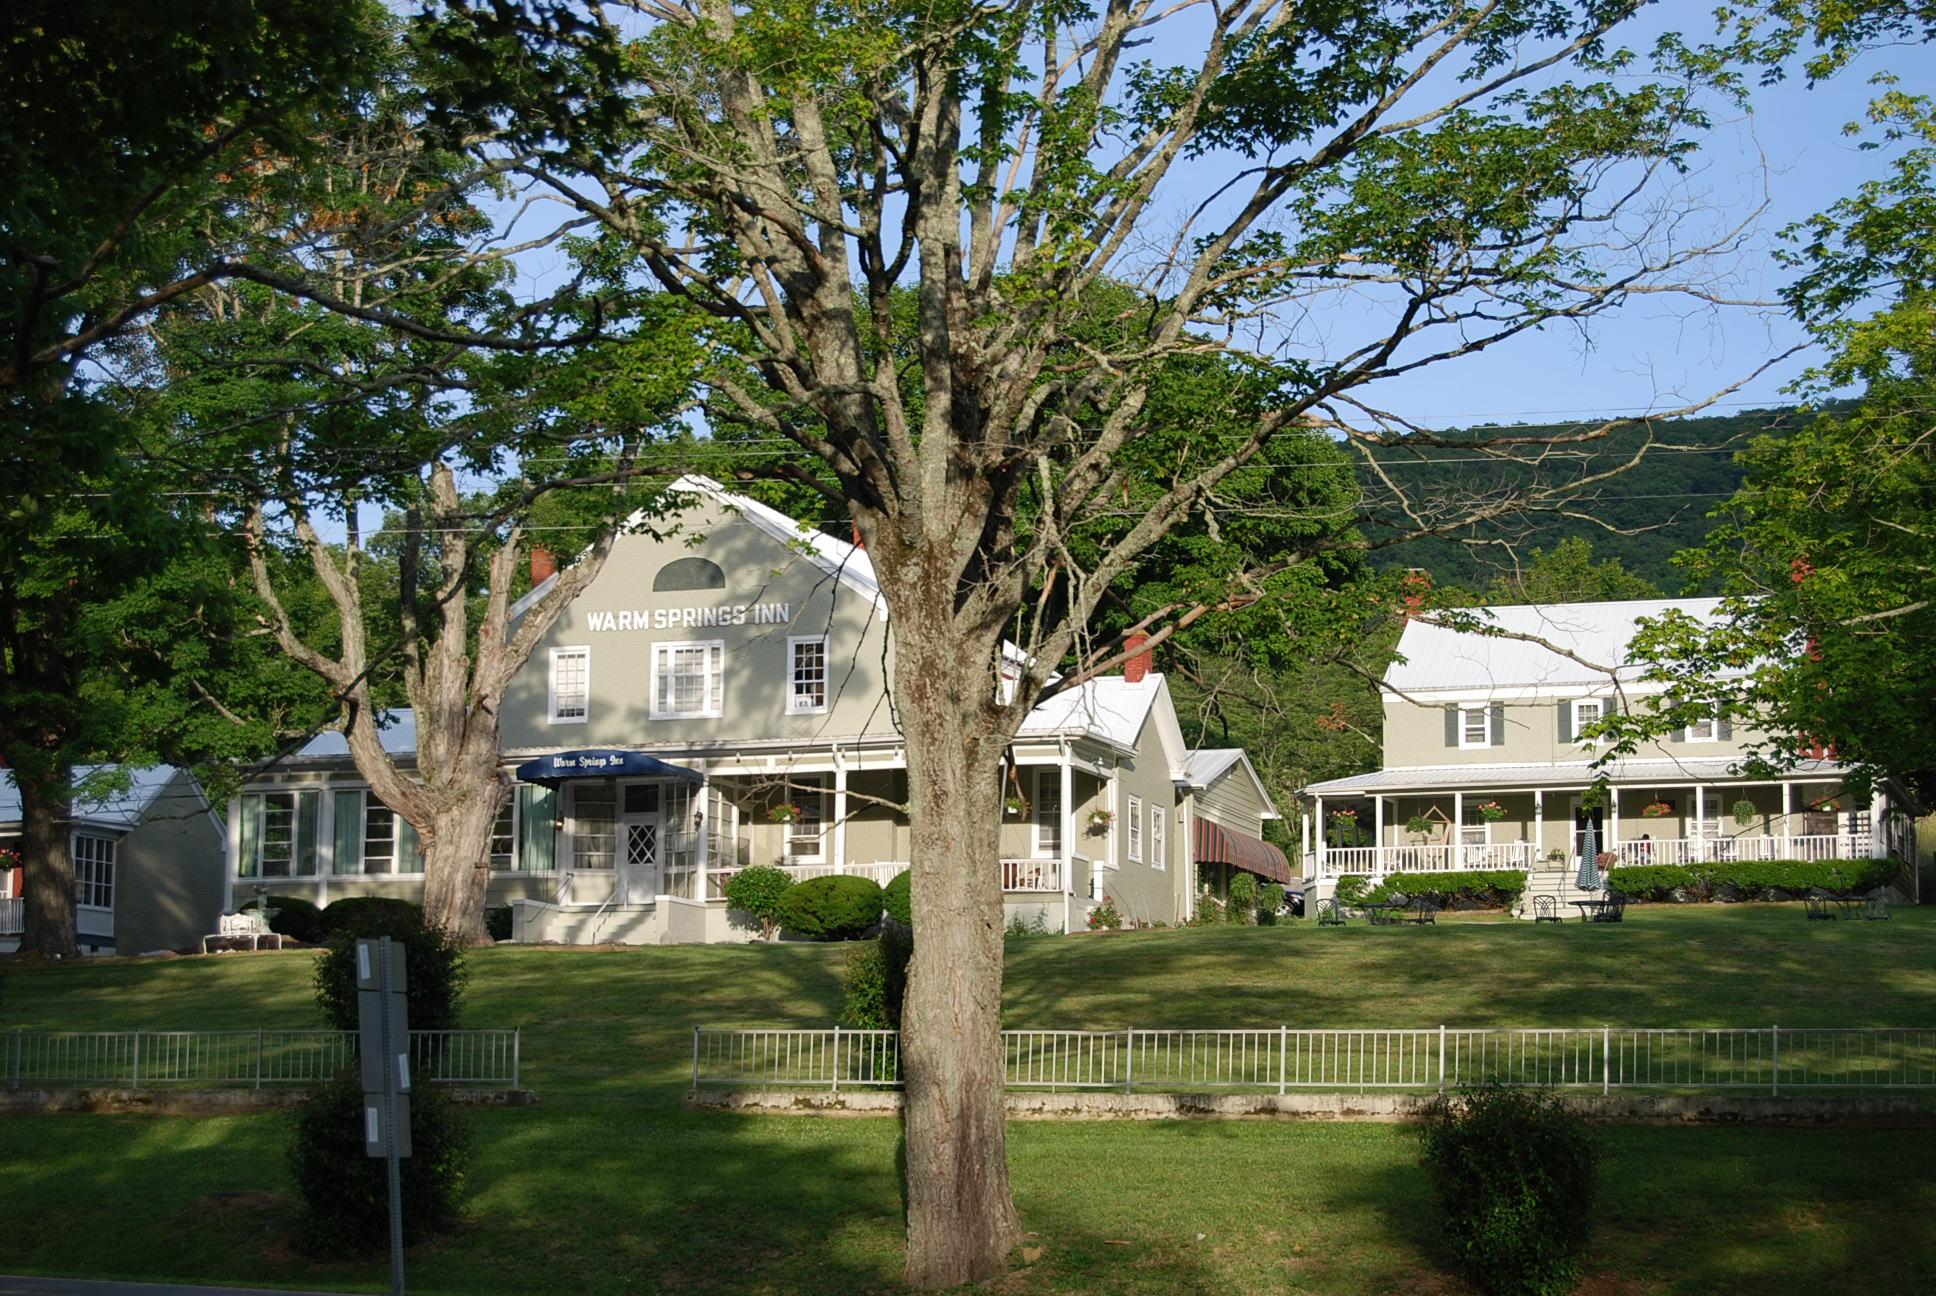 Warm Springs Inn